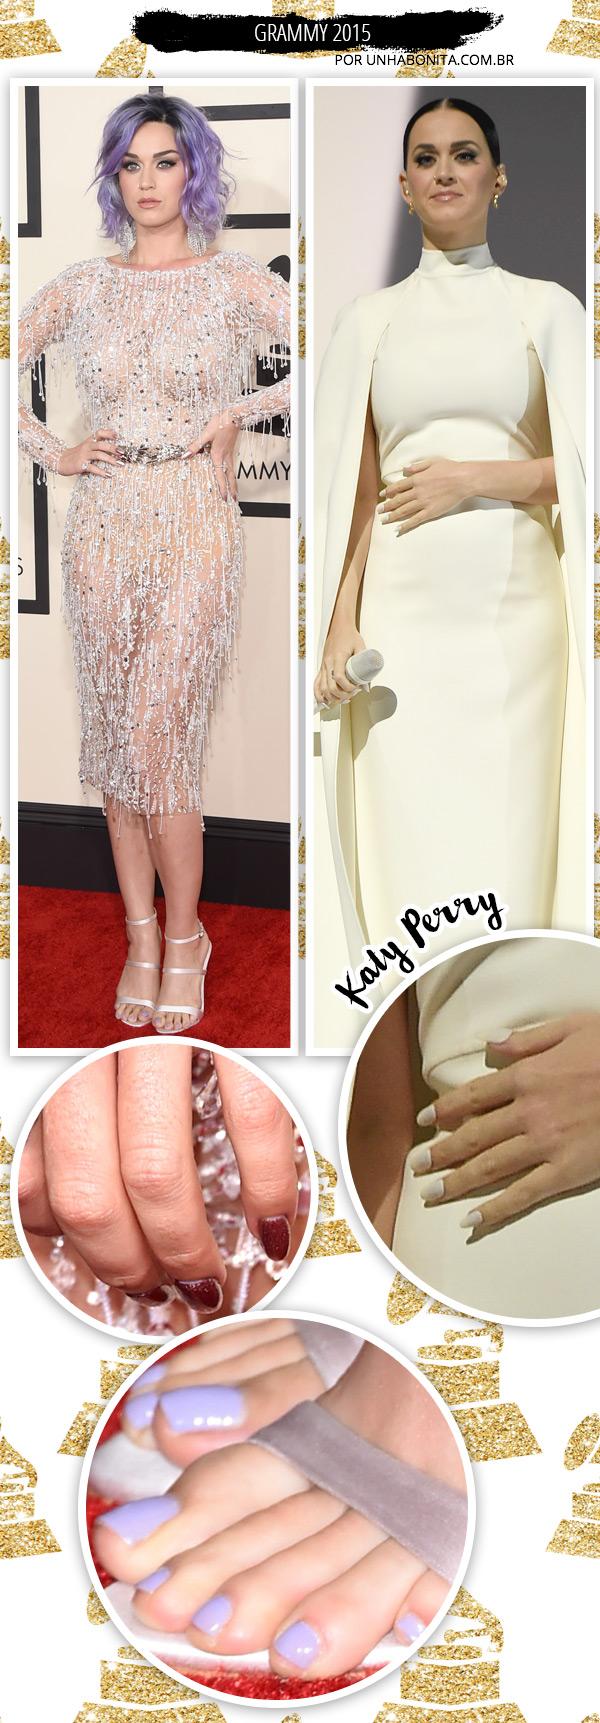 katy-perry-grammy-2015-manicure